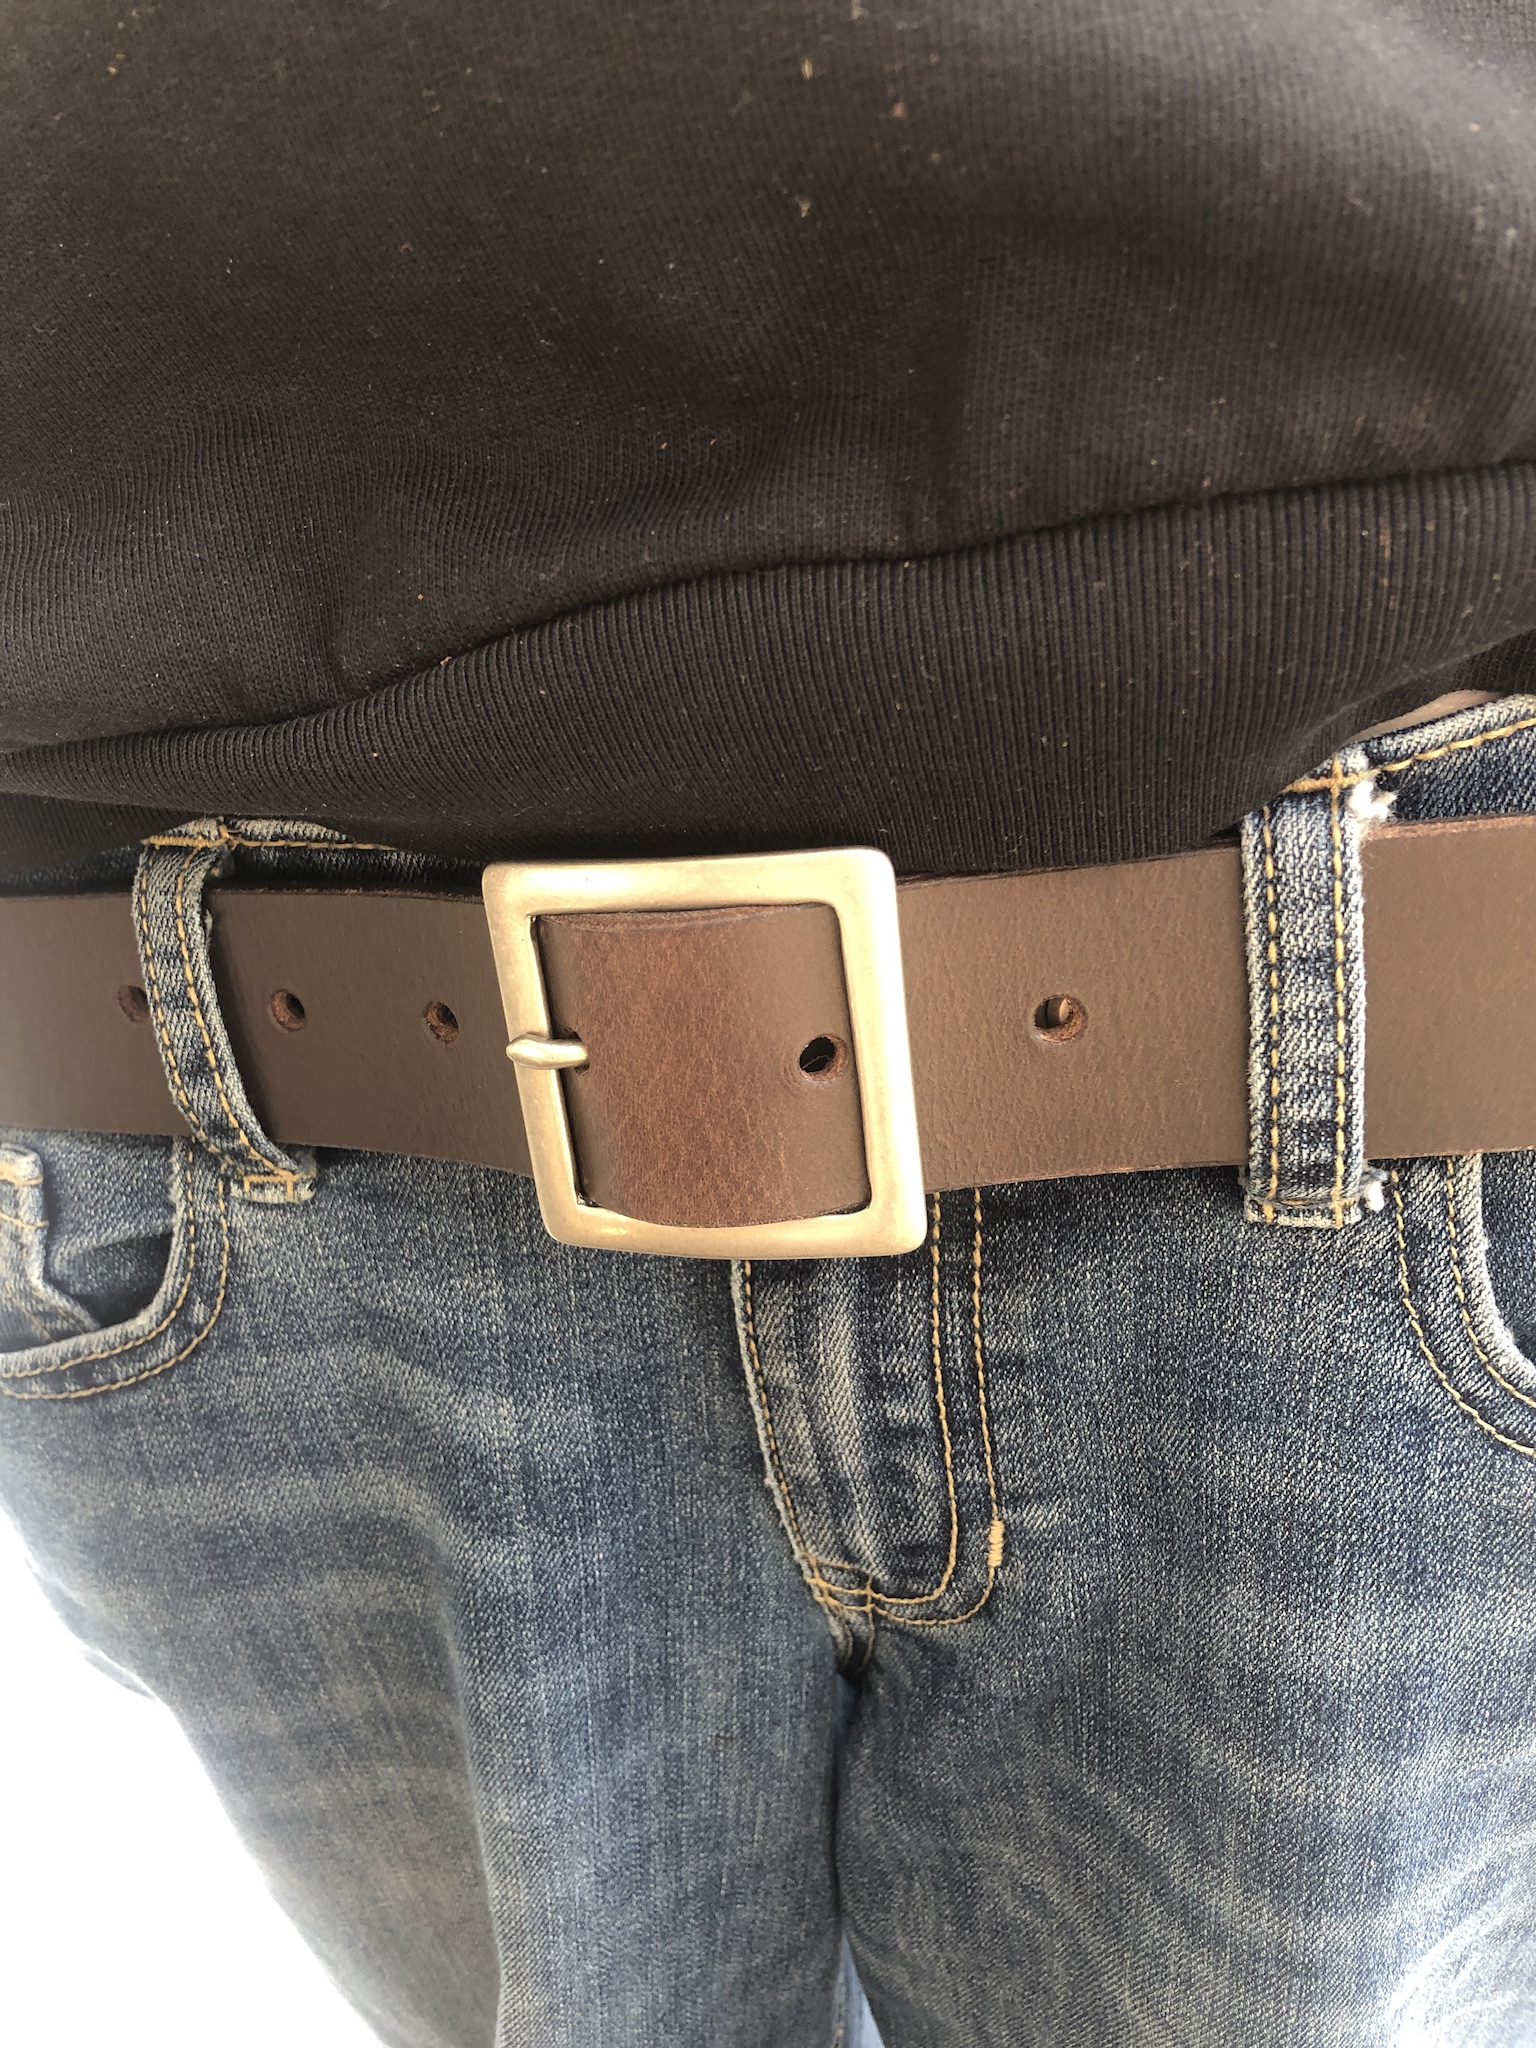 Belt - the Badger House Leather signature belt